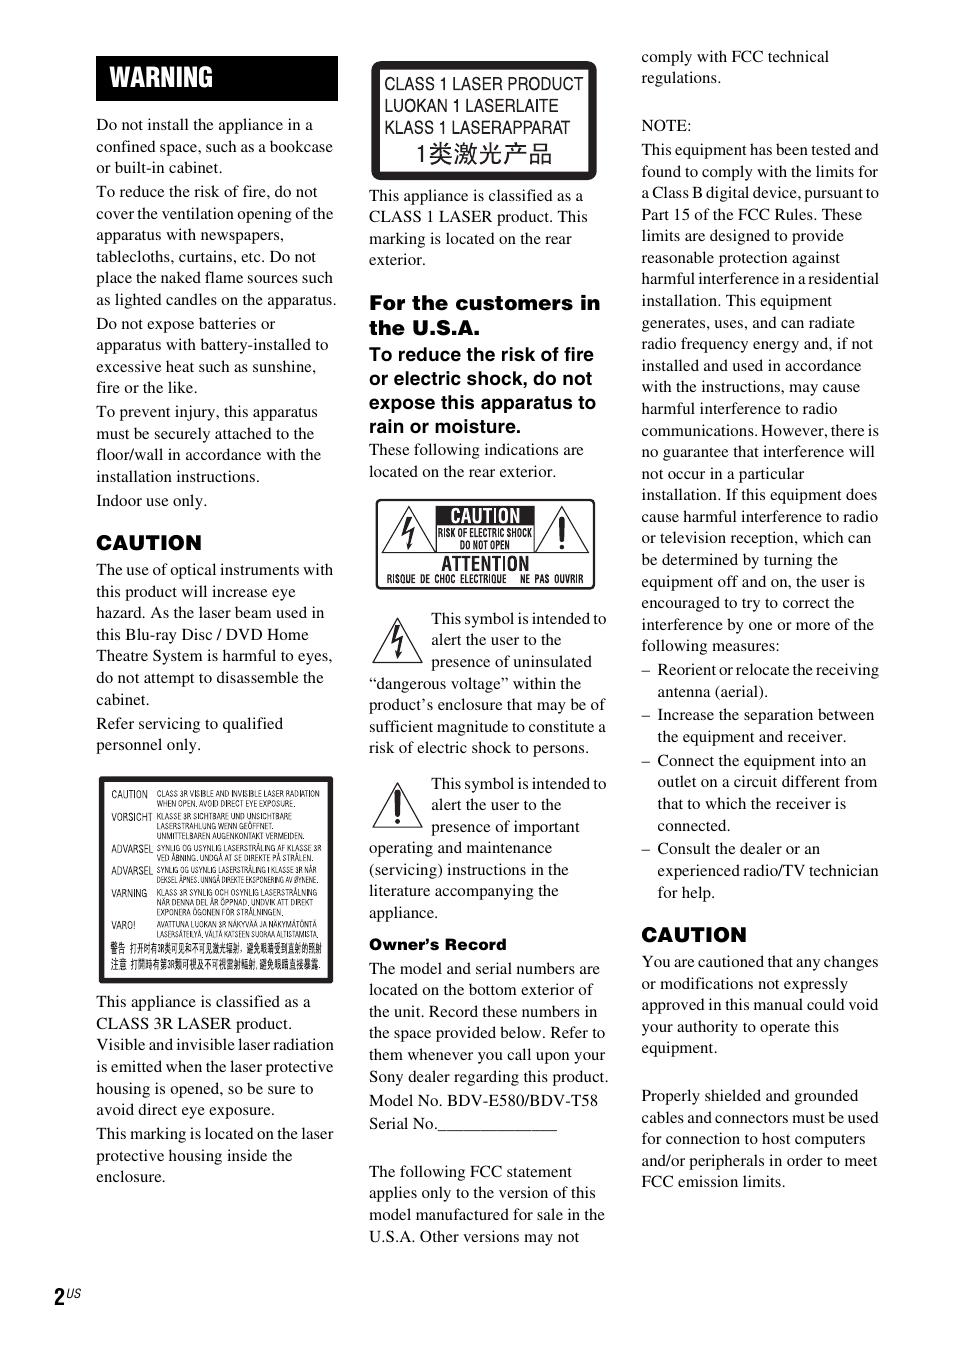 warning sony bdv t58 user manual page 2 72 original mode rh manualsdir com